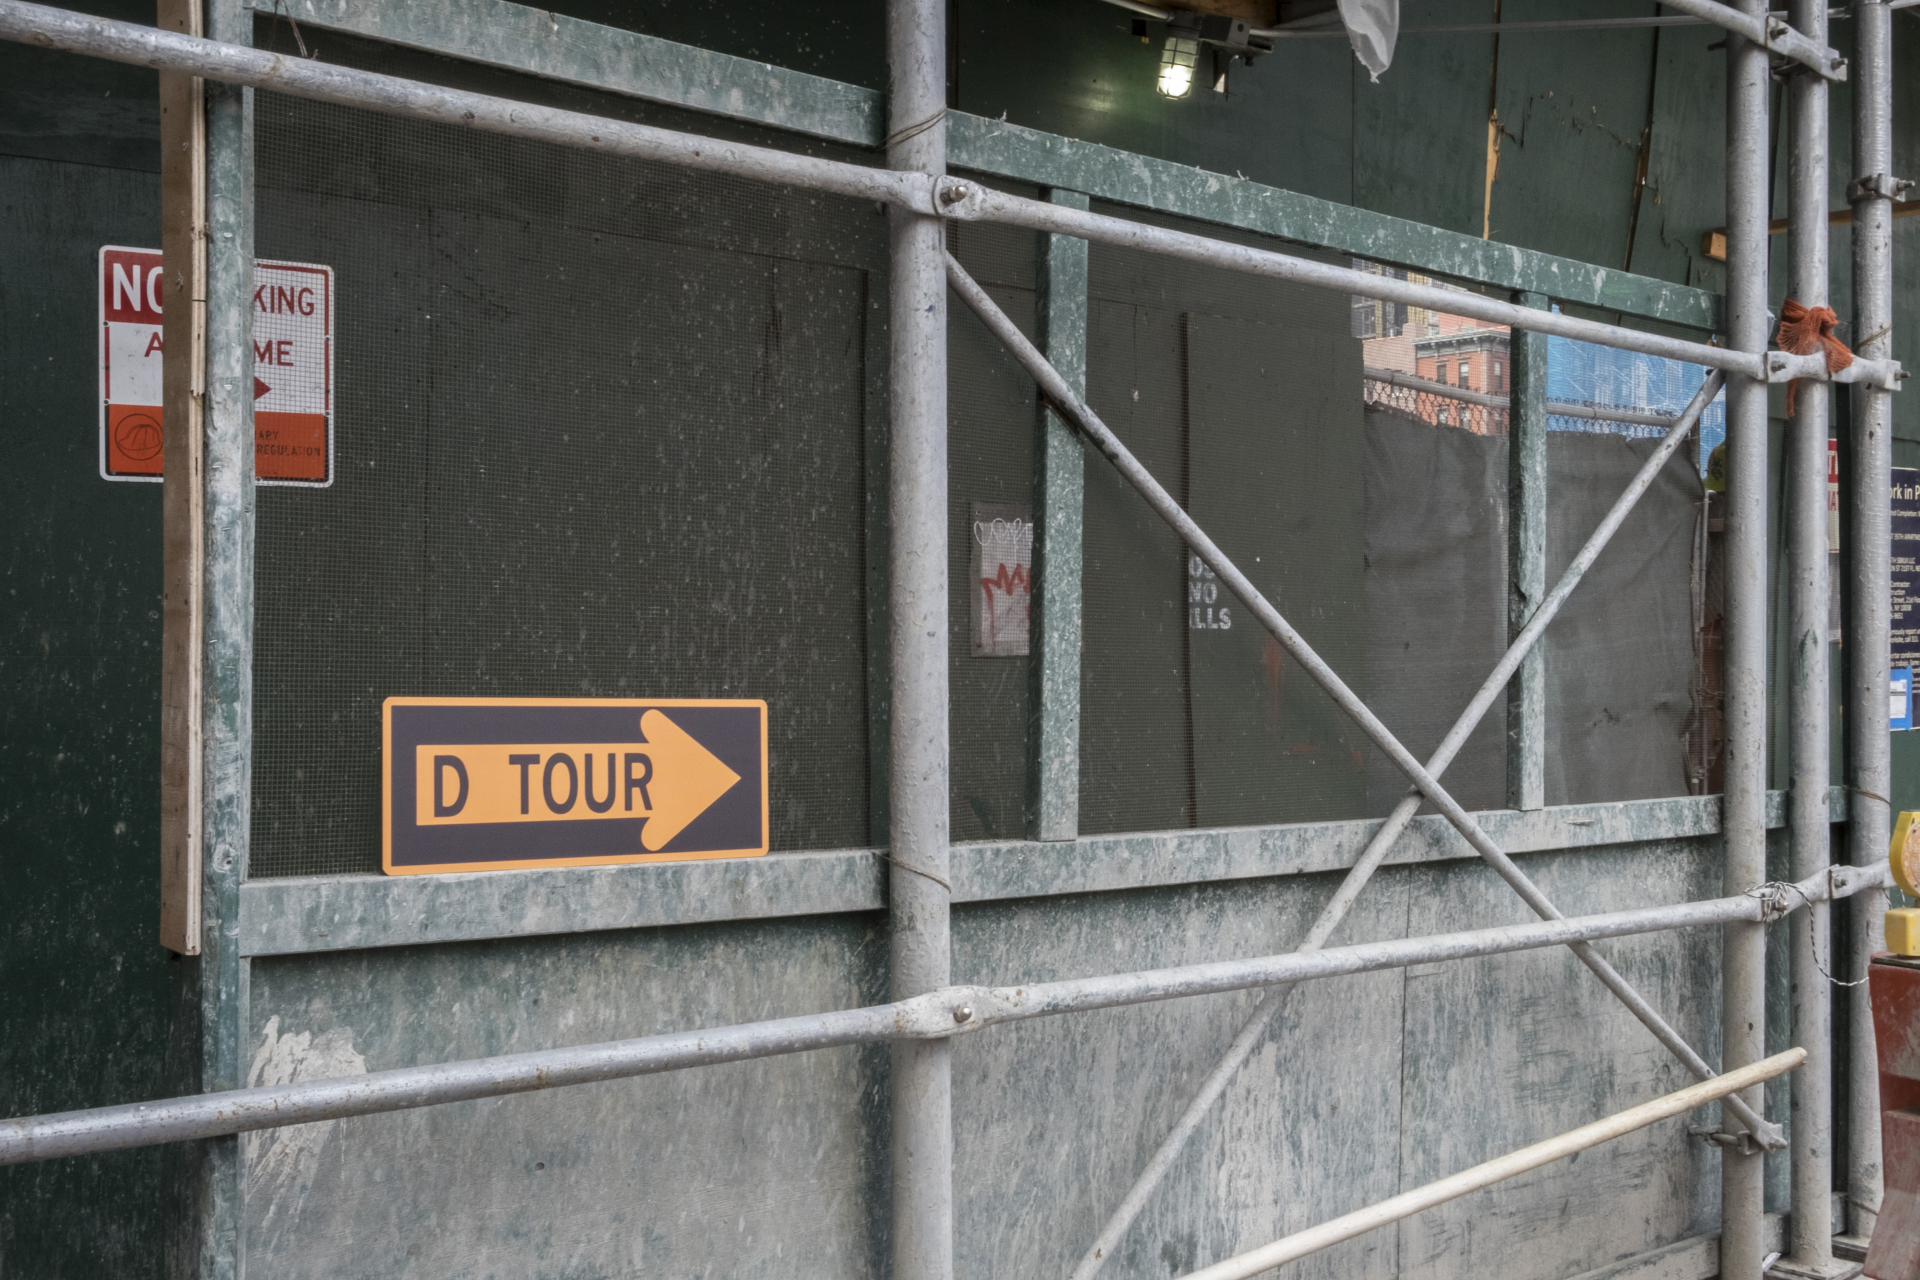 Double-Take(Ver.08) - D TOUR